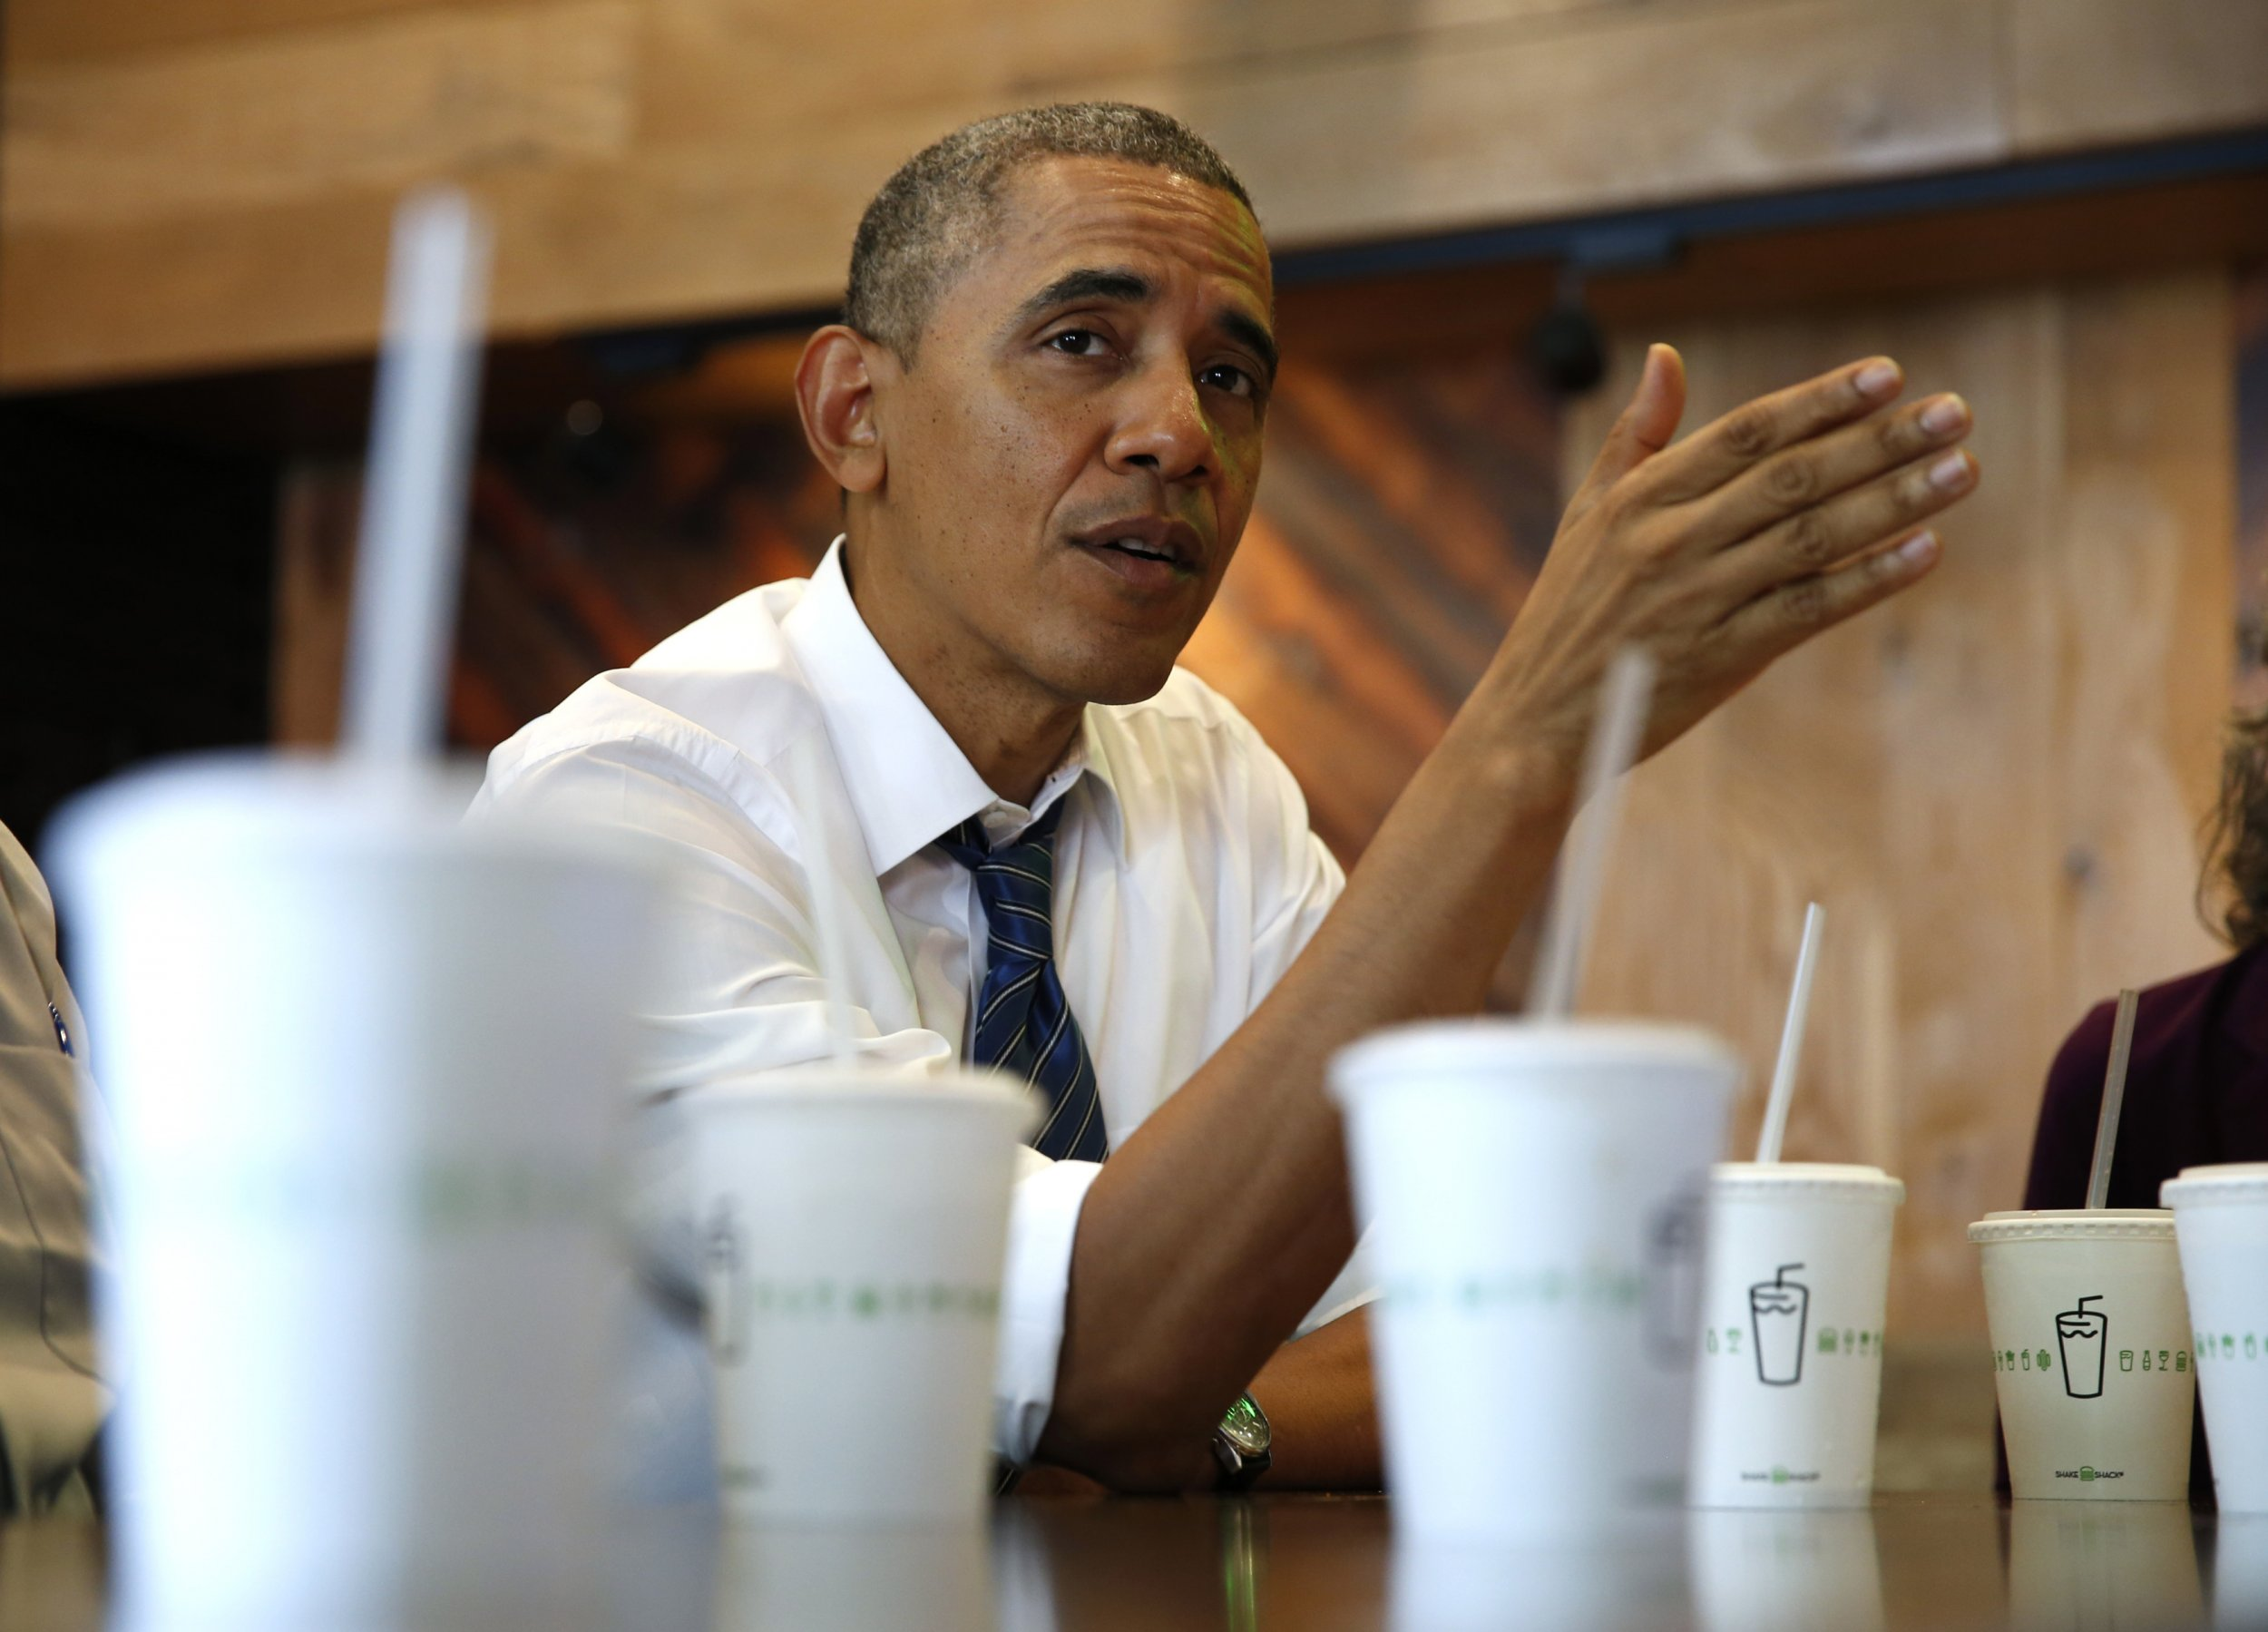 Obama At Shake Shack